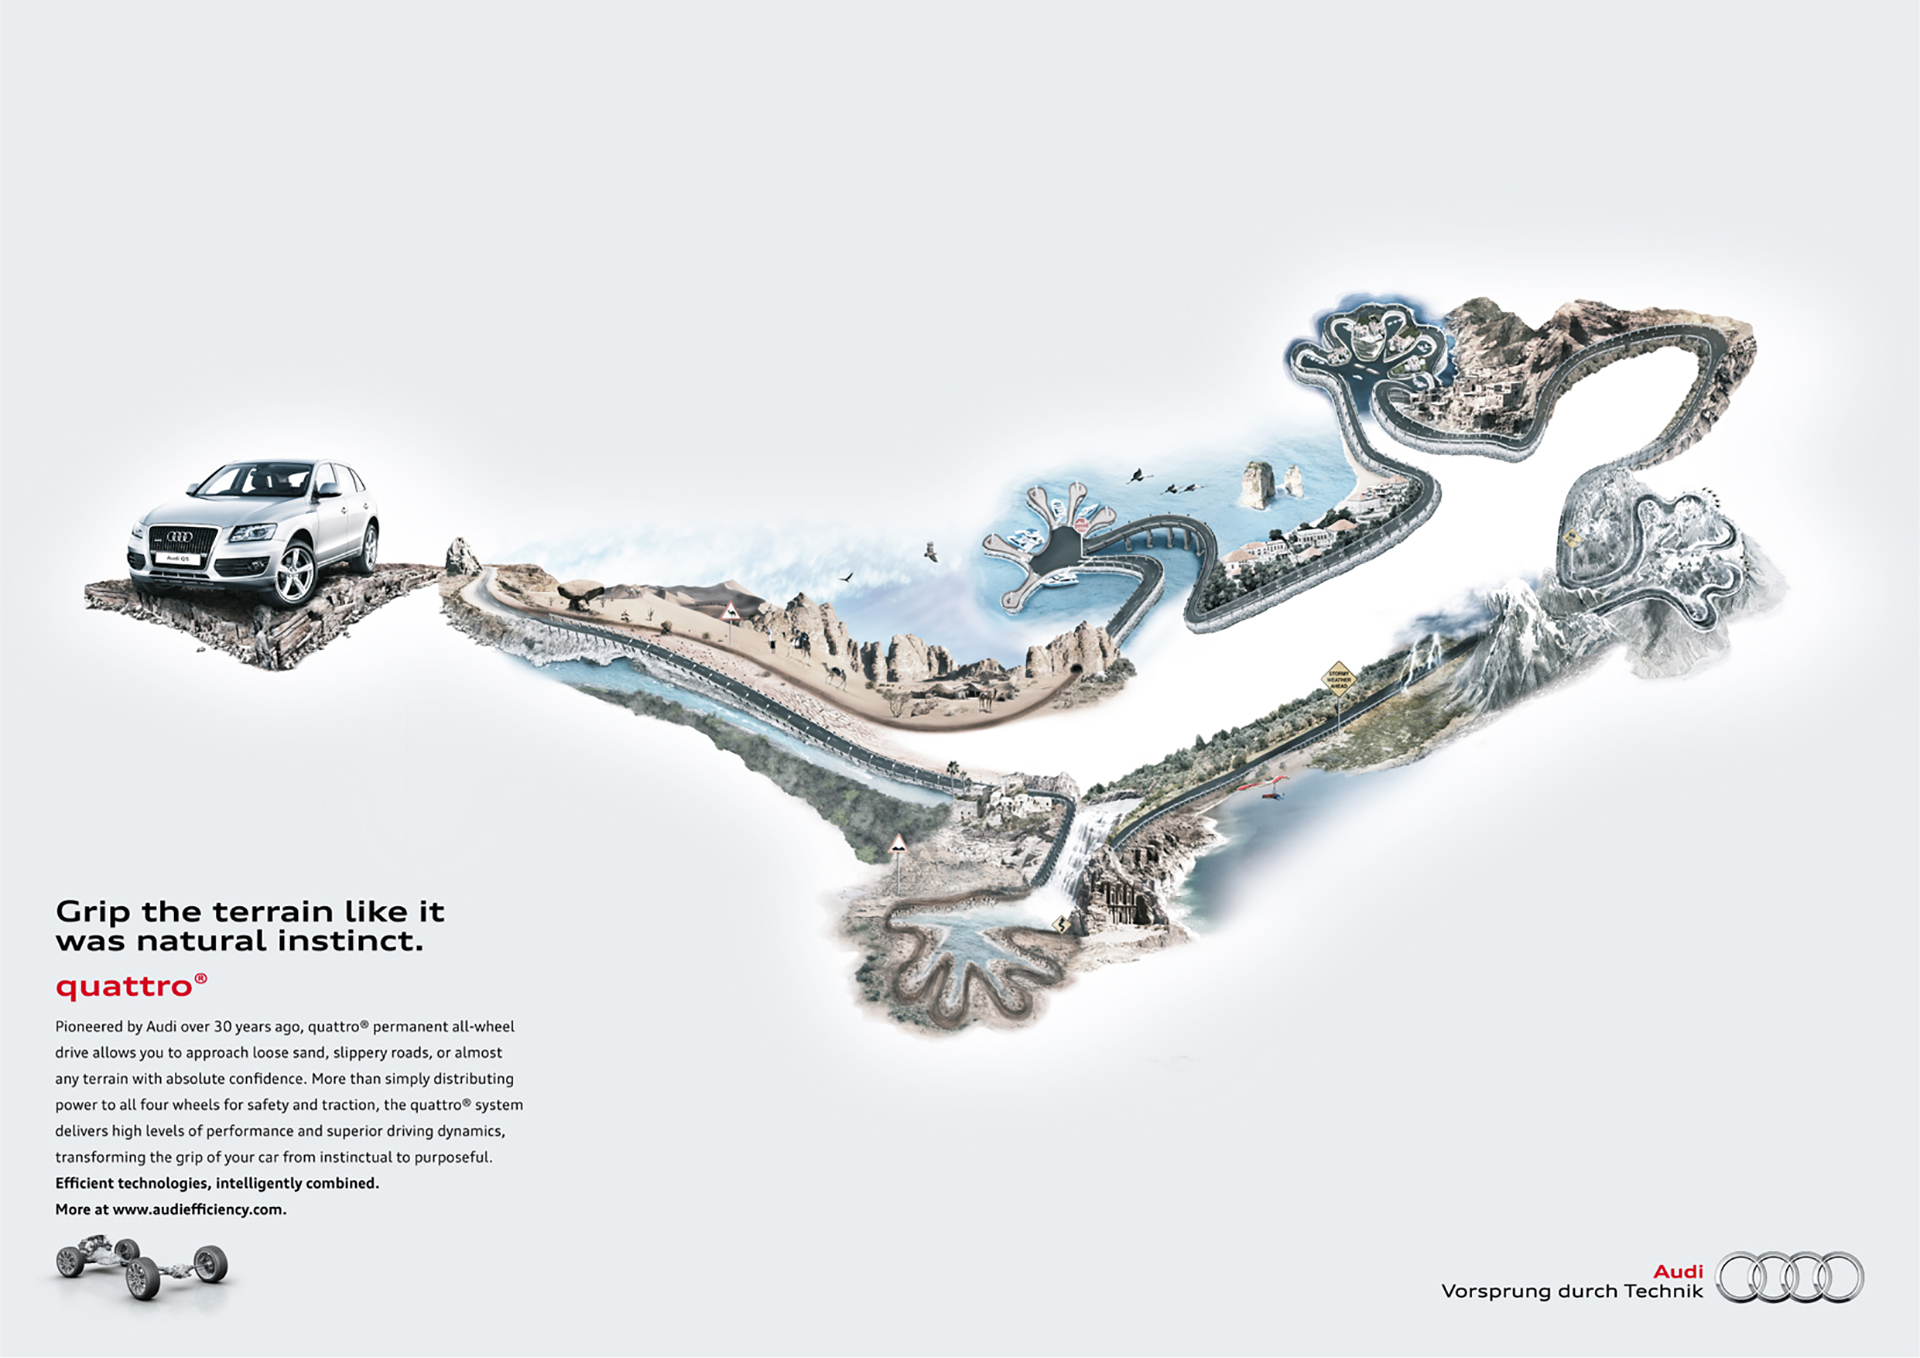 022 Audi-Efficiency-Gecko